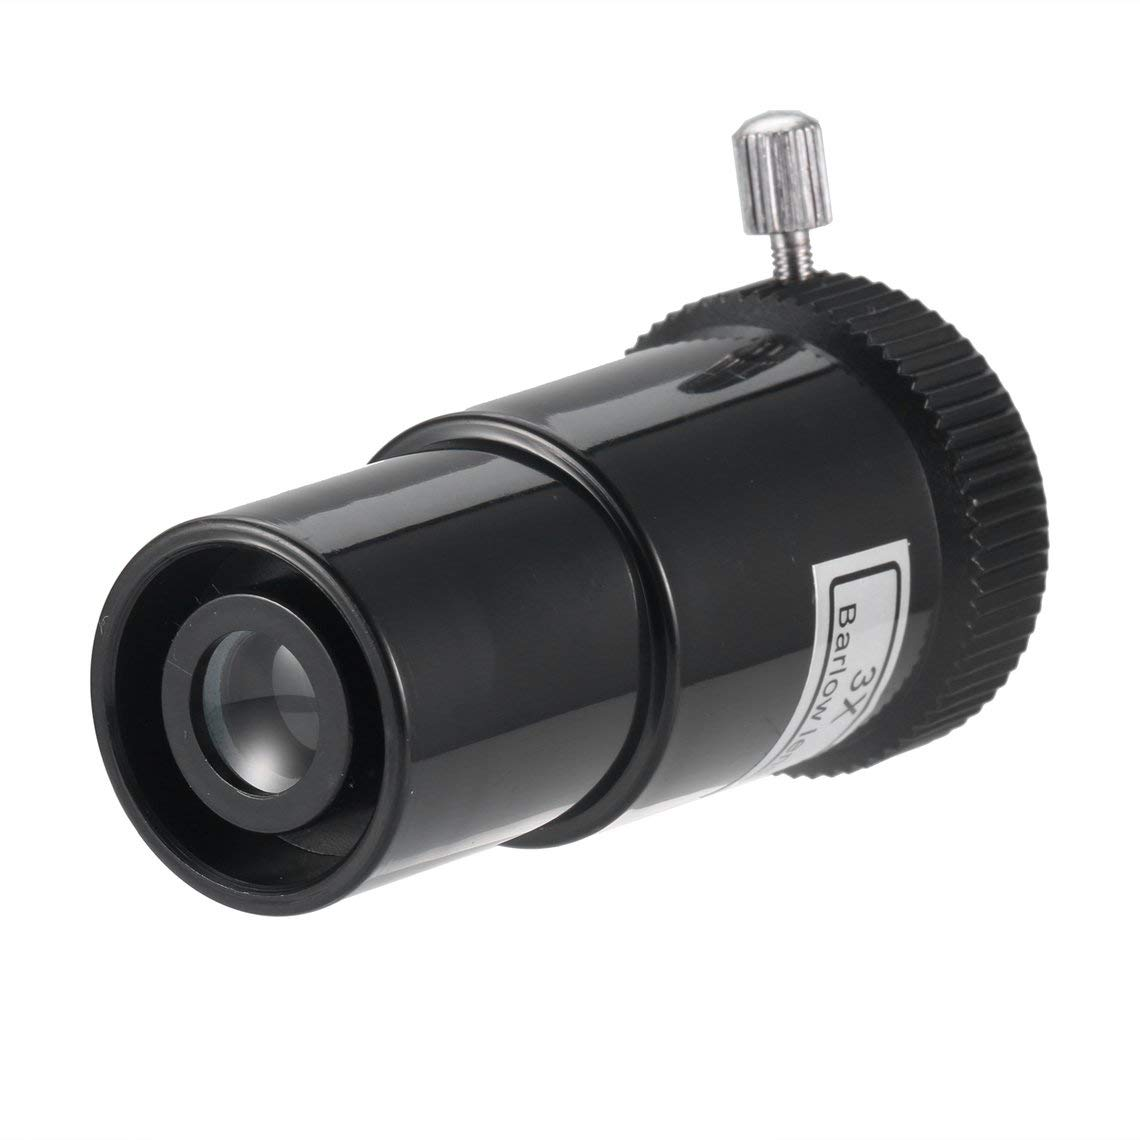 Zinniaya 0.965 Pulgadas 3X Barlow Lente de Vidrio /óptico ABS Marco de pl/ástico 3X para Accesorios de Ocular telescopio astron/ómico